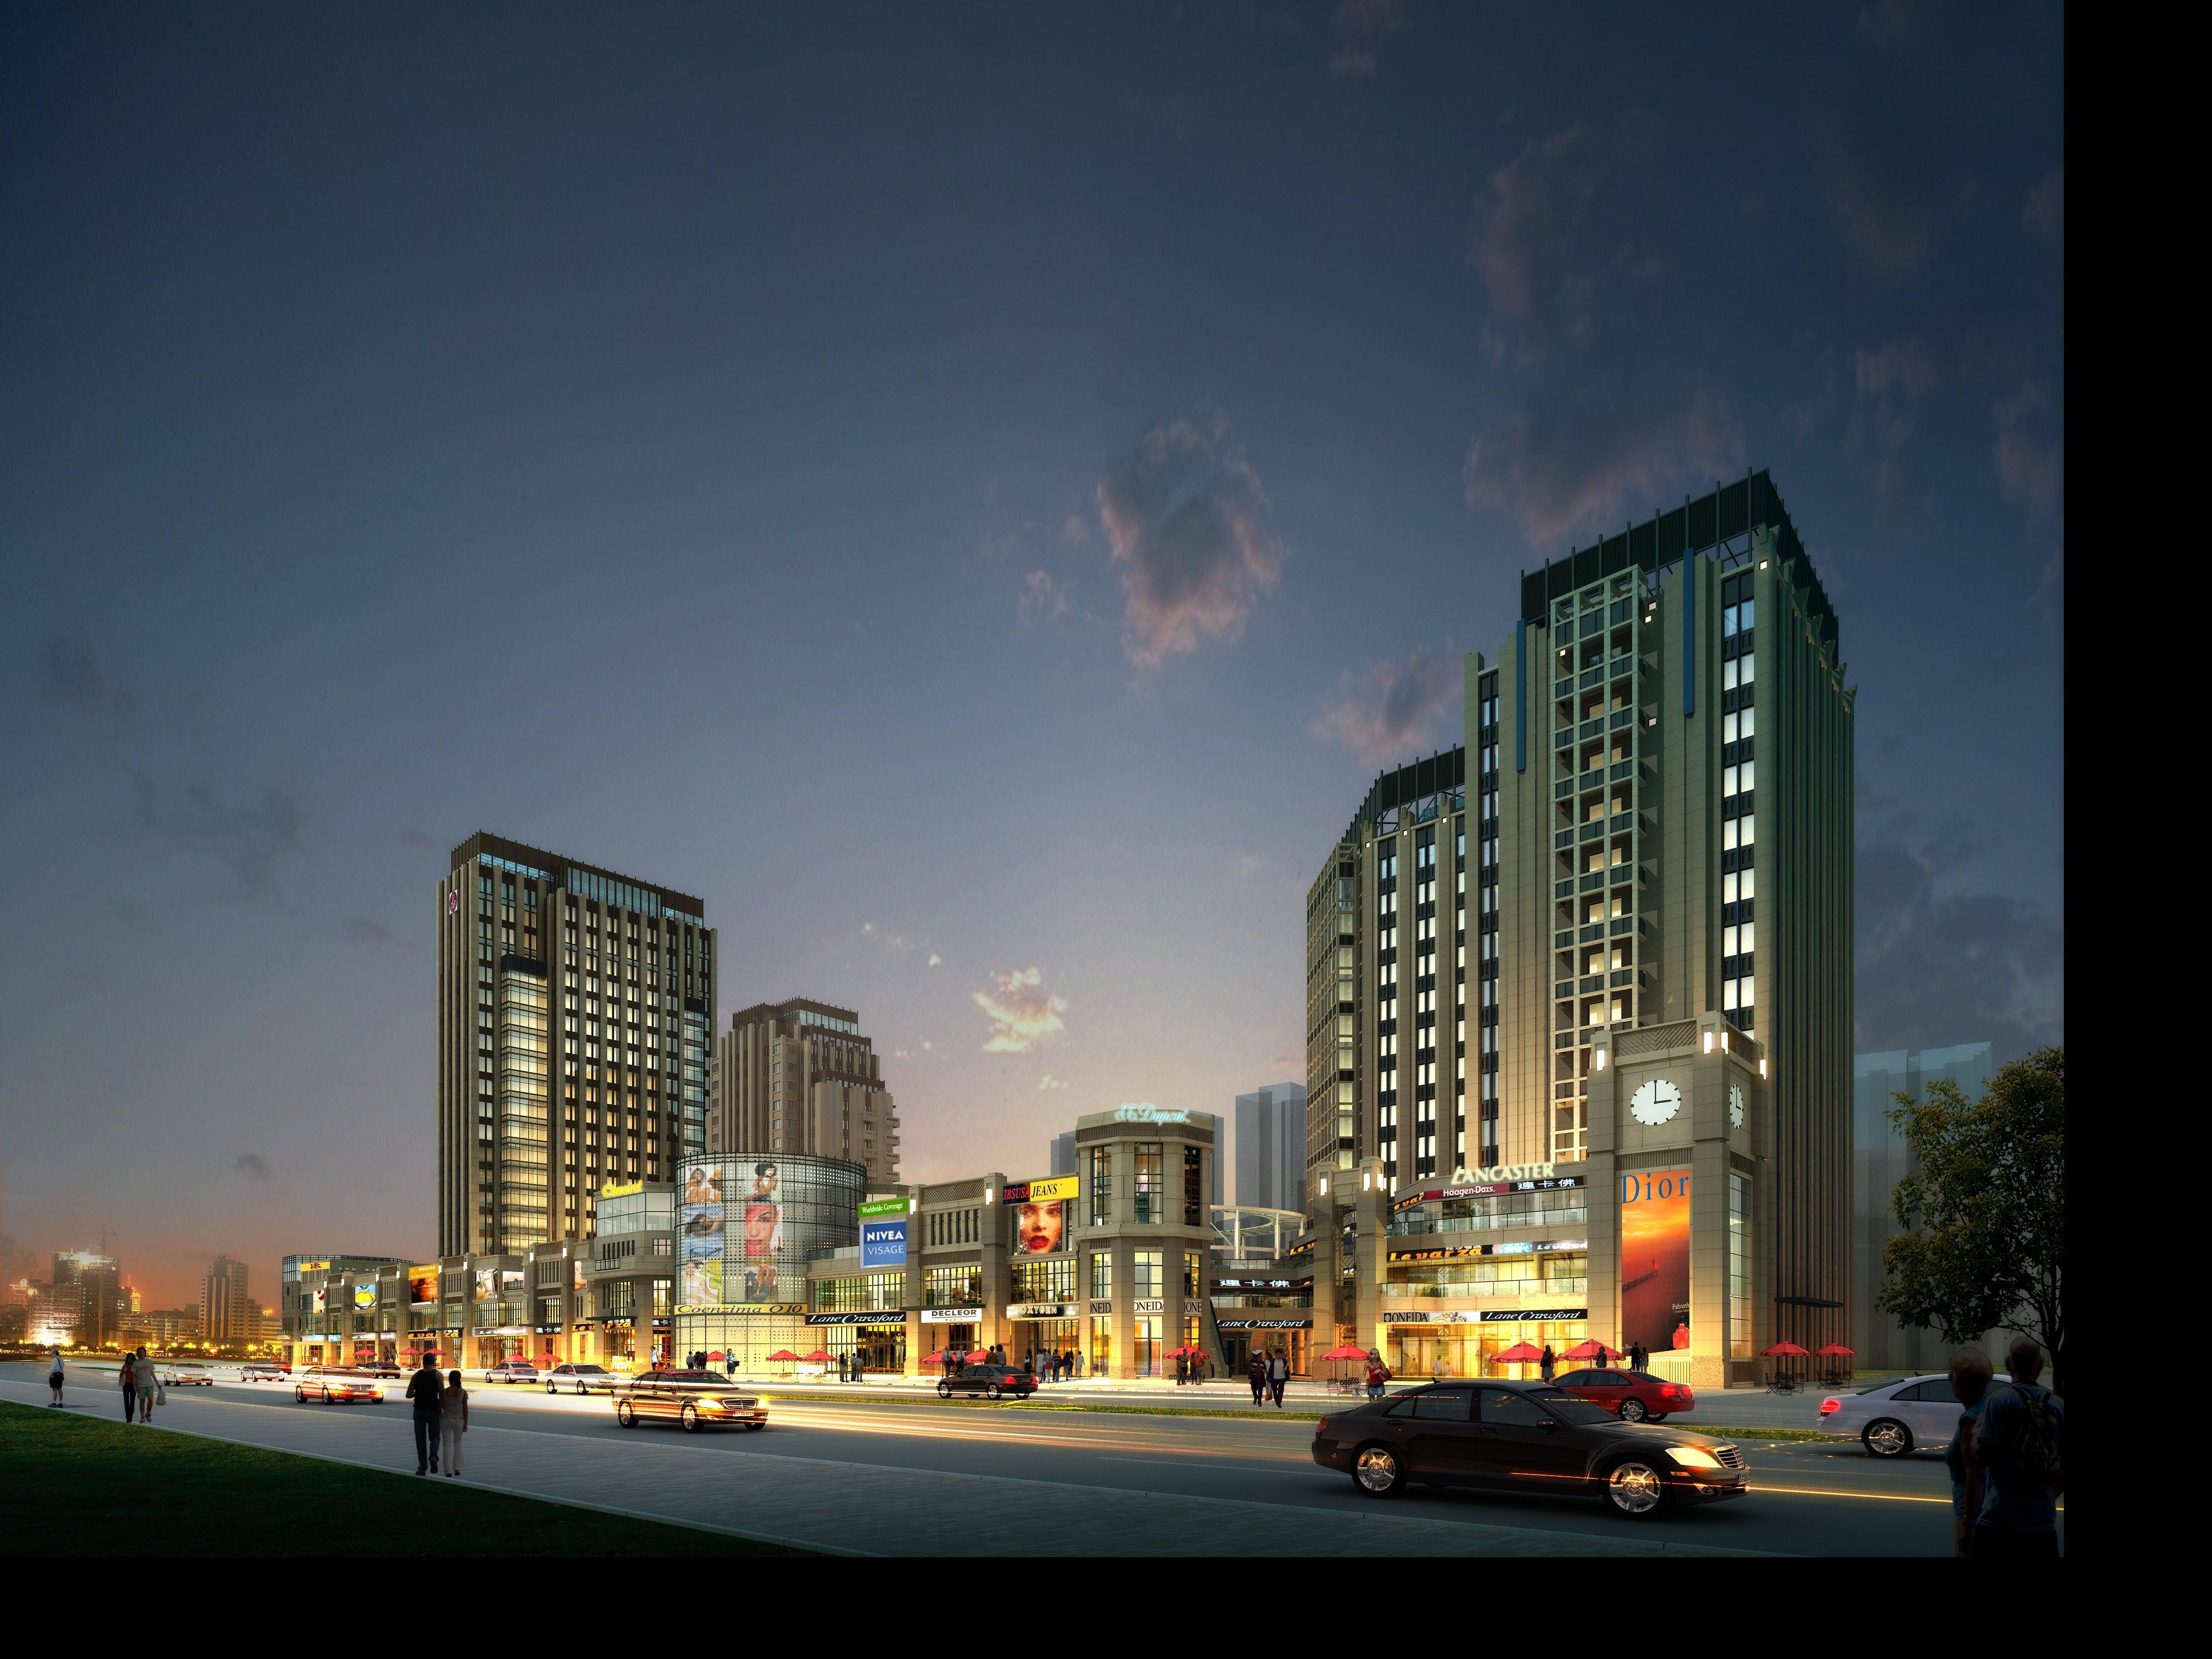 night cityscape 924 3d загвар max psd 121810